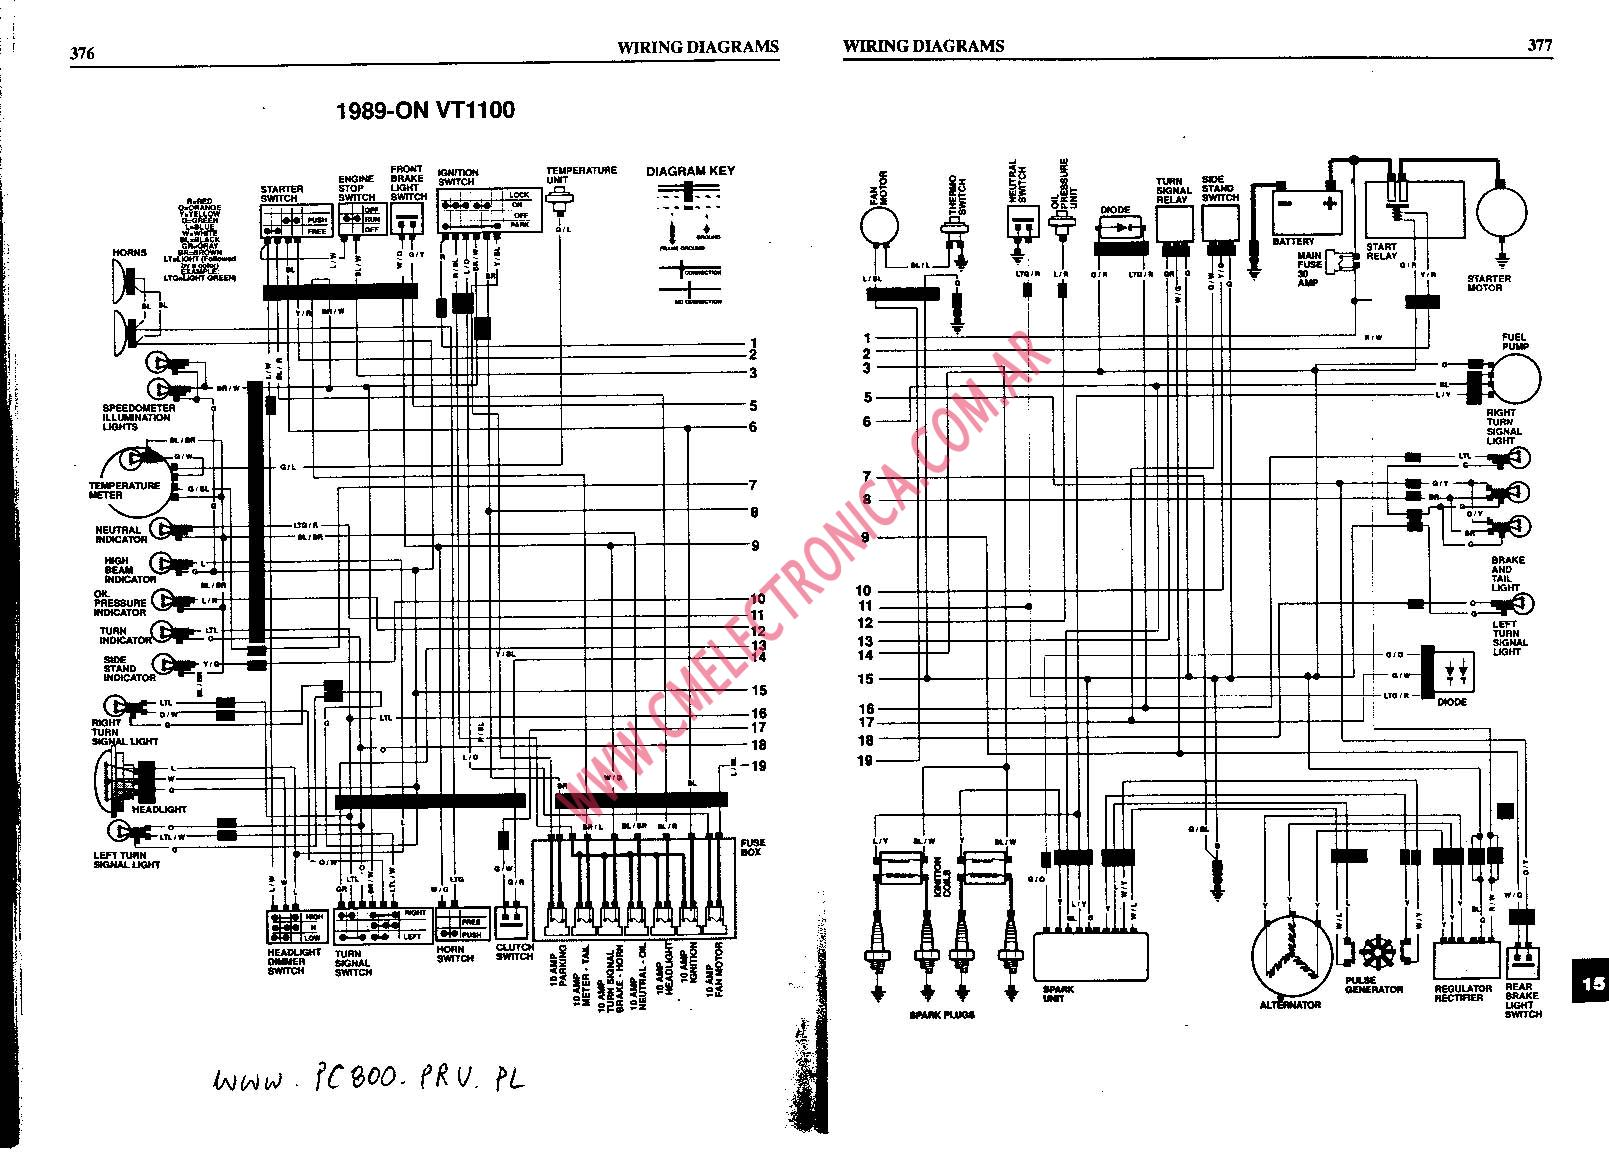 2000 Vt1100 Wiring Diagram -2000 Mitsubishi Montero Sport Engine Diagram |  Begeboy Wiring Diagram SourceBegeboy Wiring Diagram Source